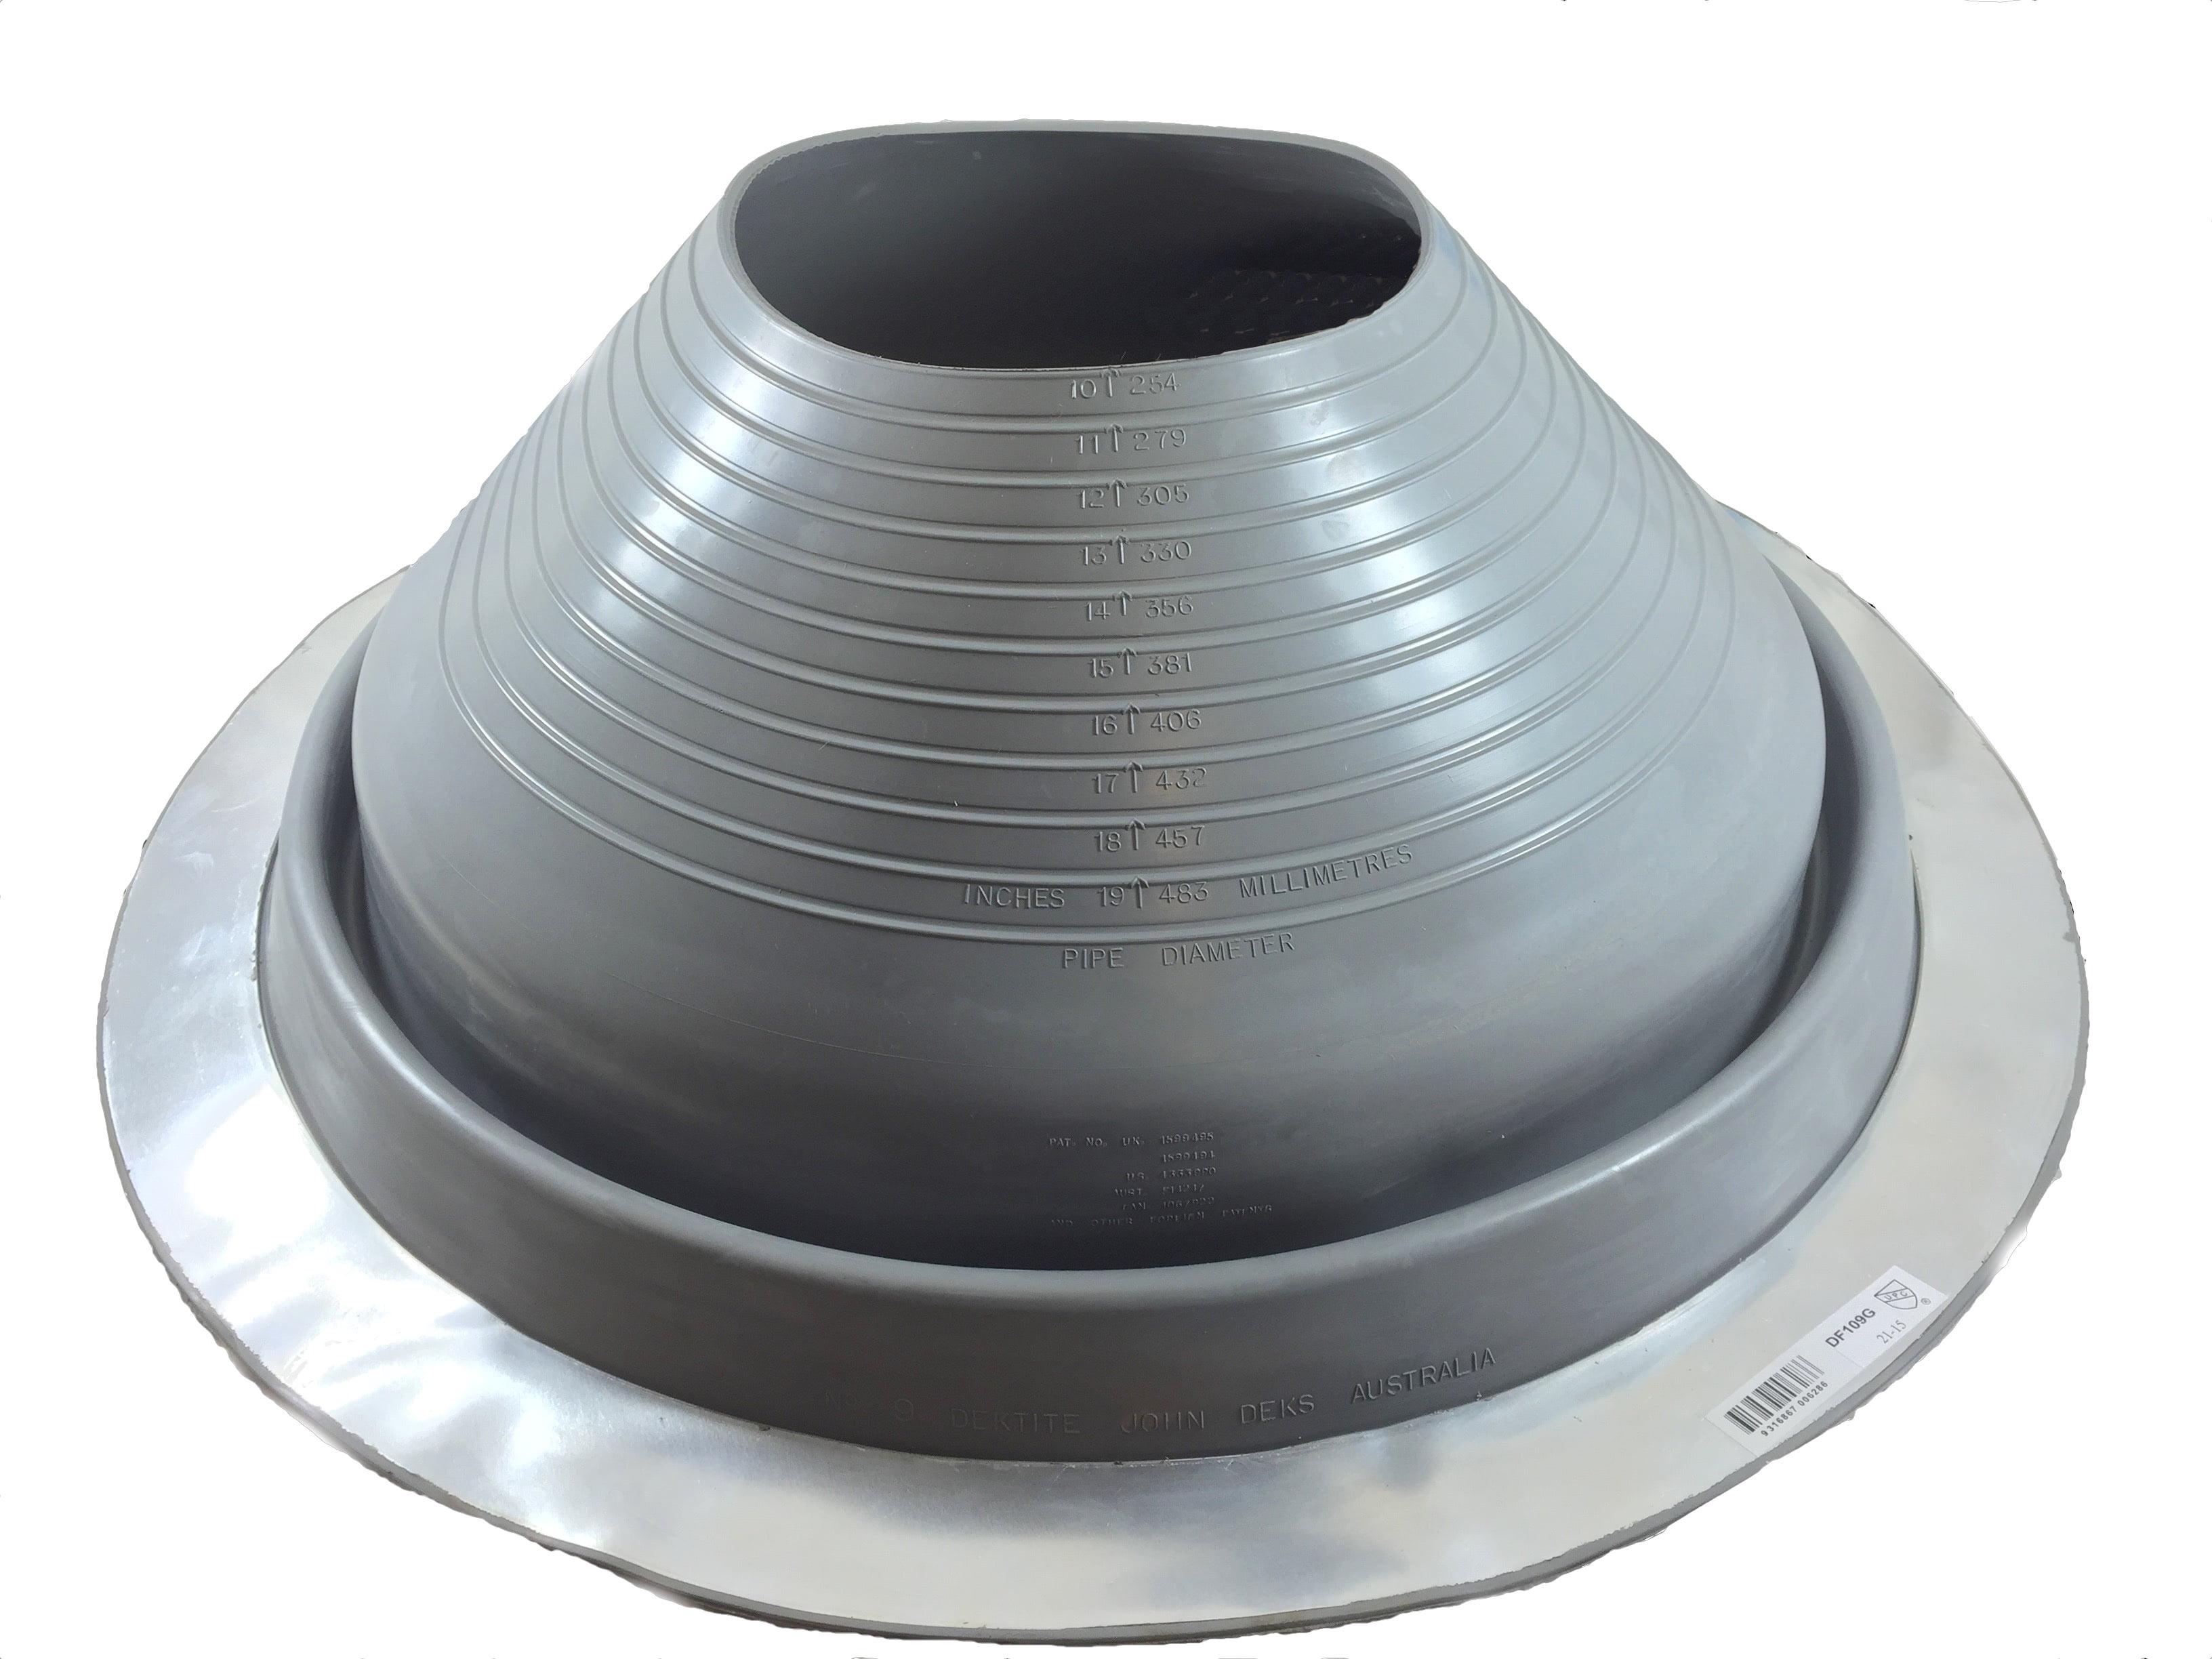 Pipe OD 5 to 9 Dektite Premium #6 Black EPDM Metal Roof Pipe Flashing Square Base